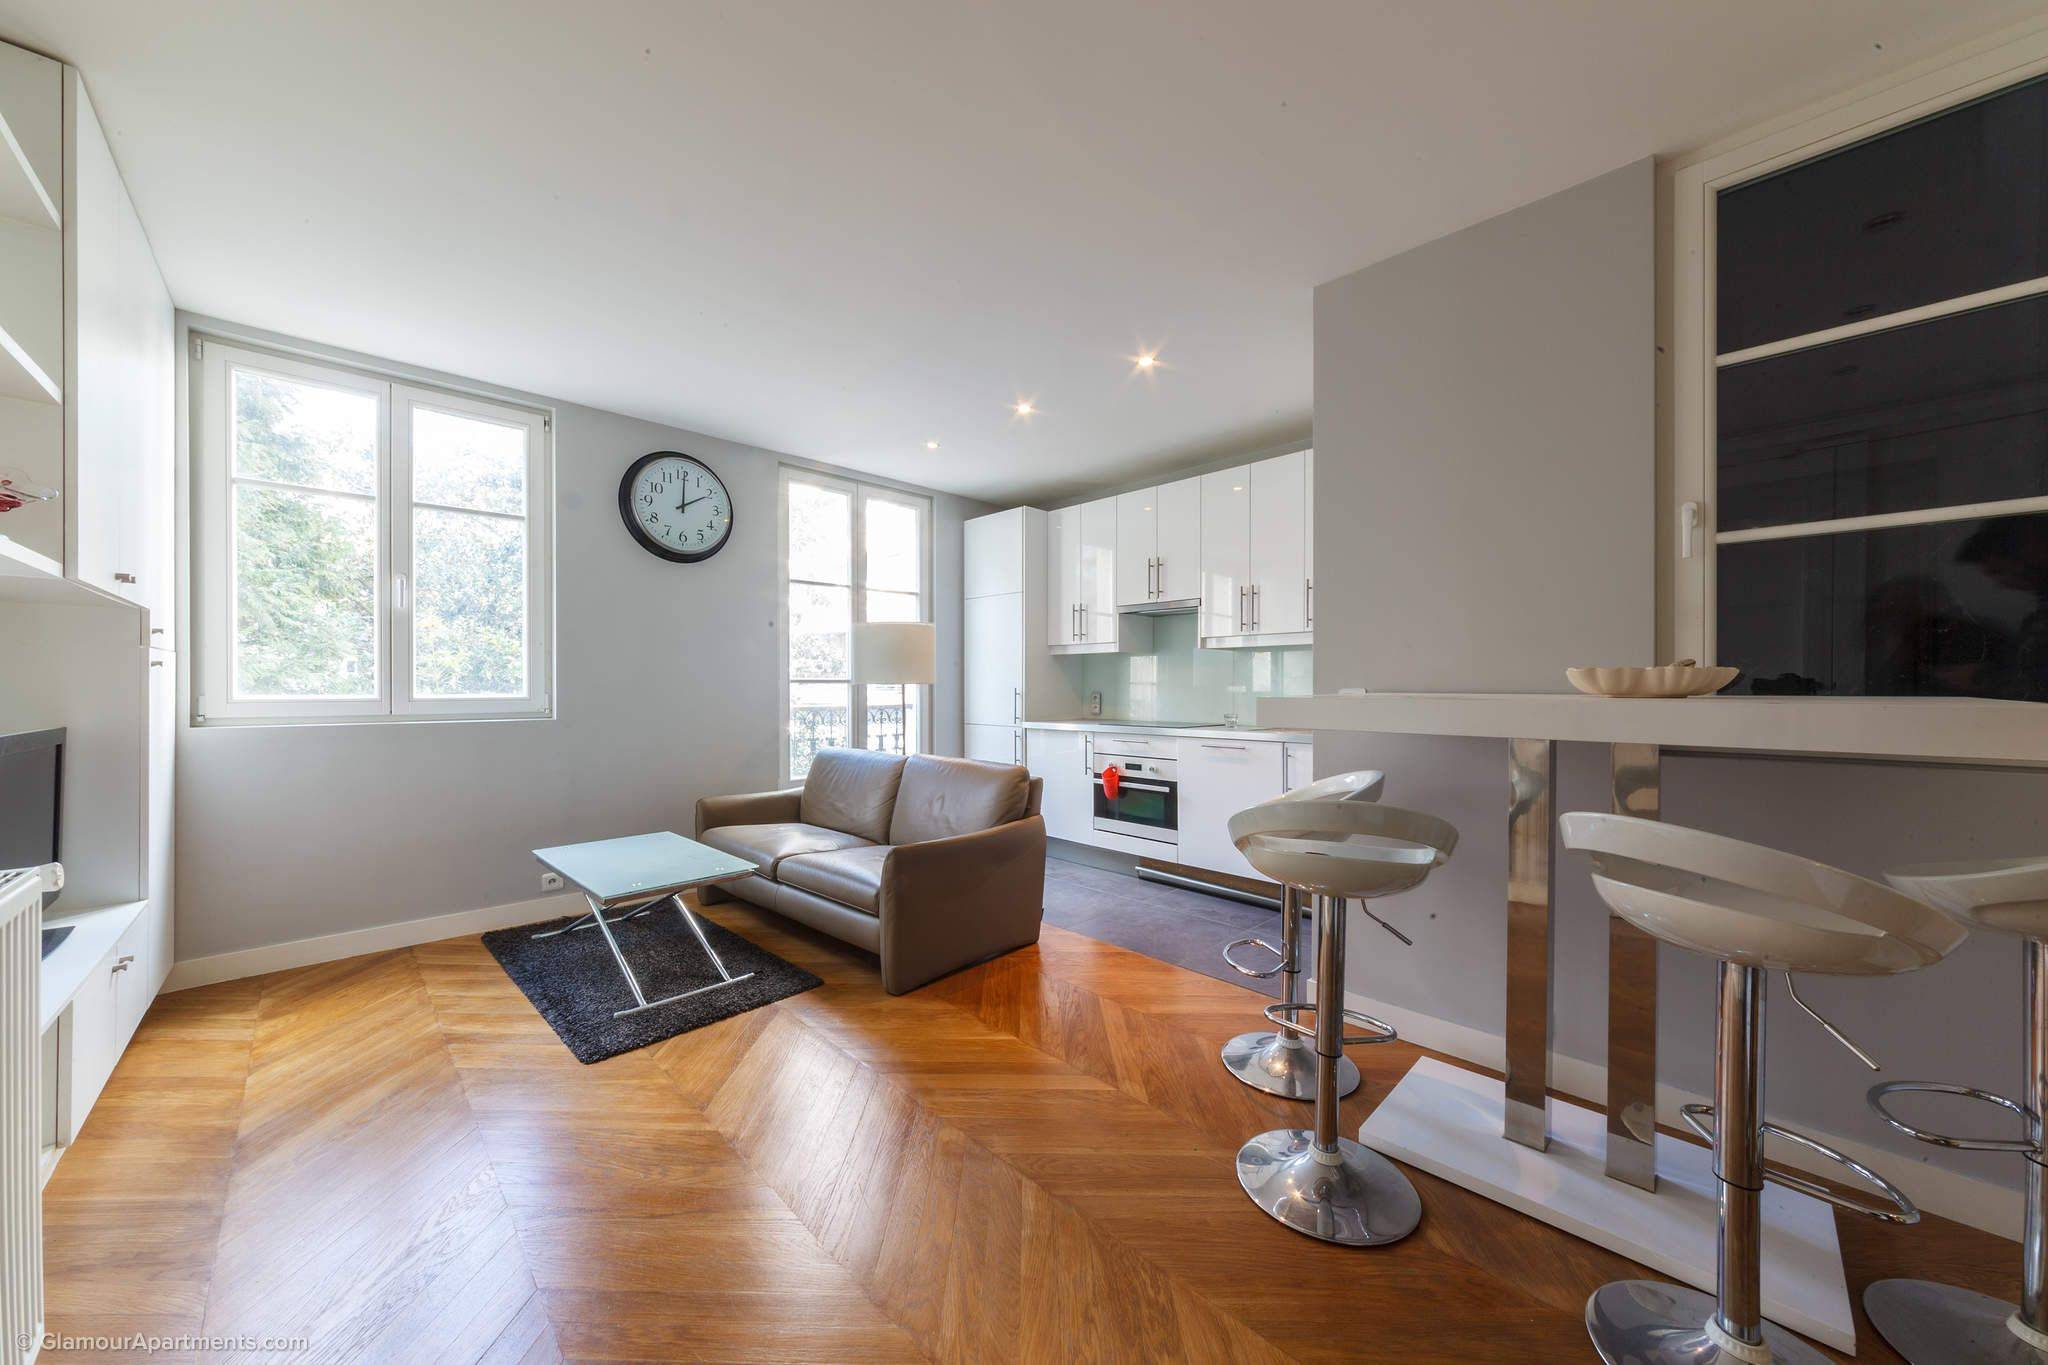 Modern 2-bedroom apartment for rent in Paris - Boulevard ...